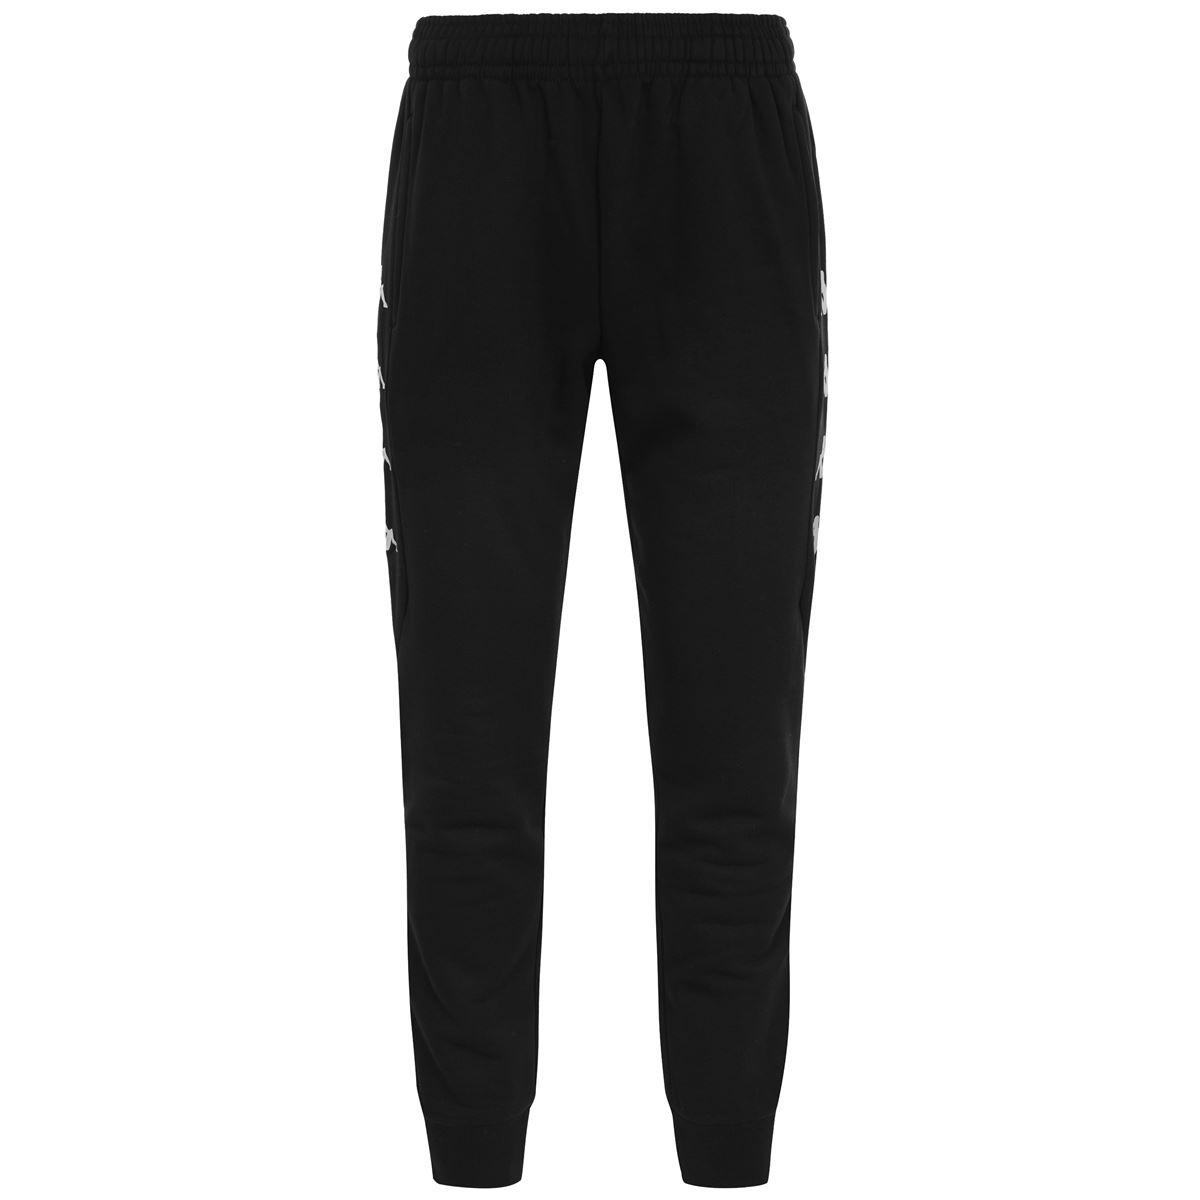 Kappa Pantaloni uomo-31153QW